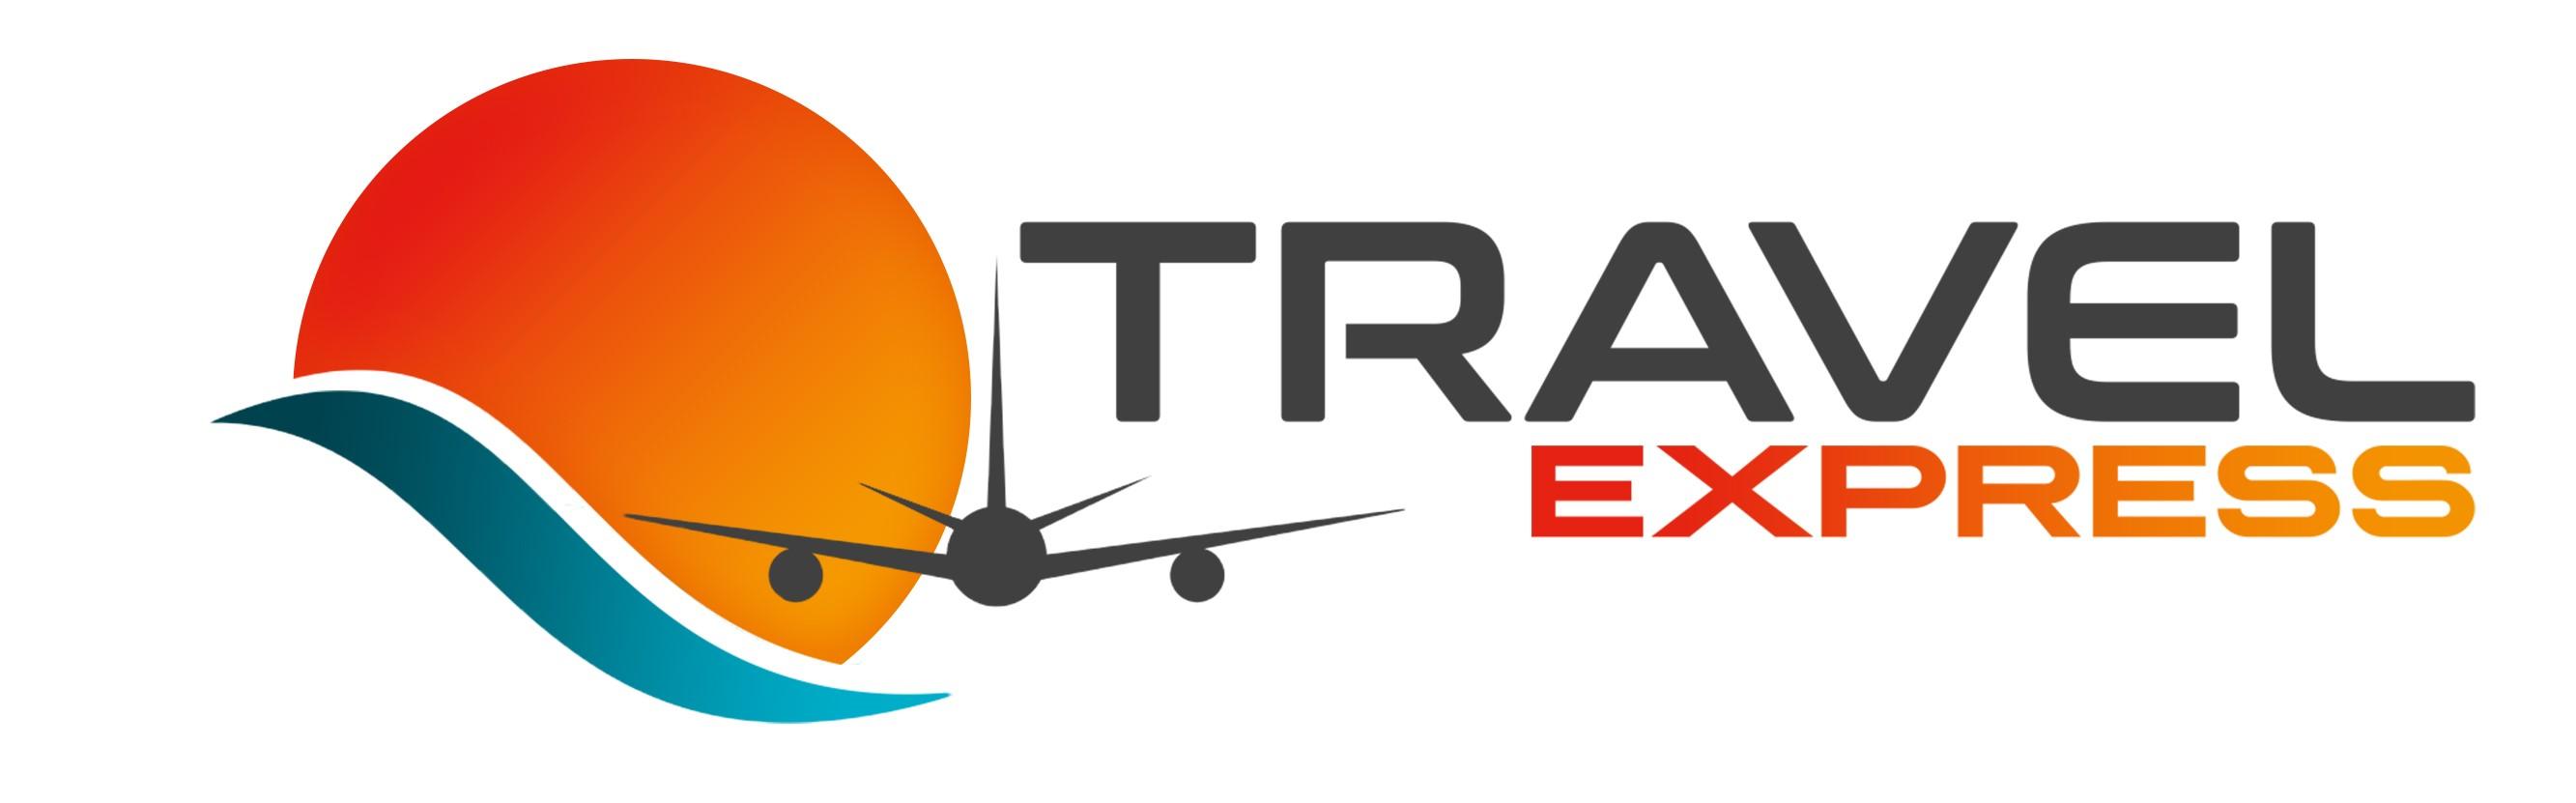 travel-express-agency.jpg